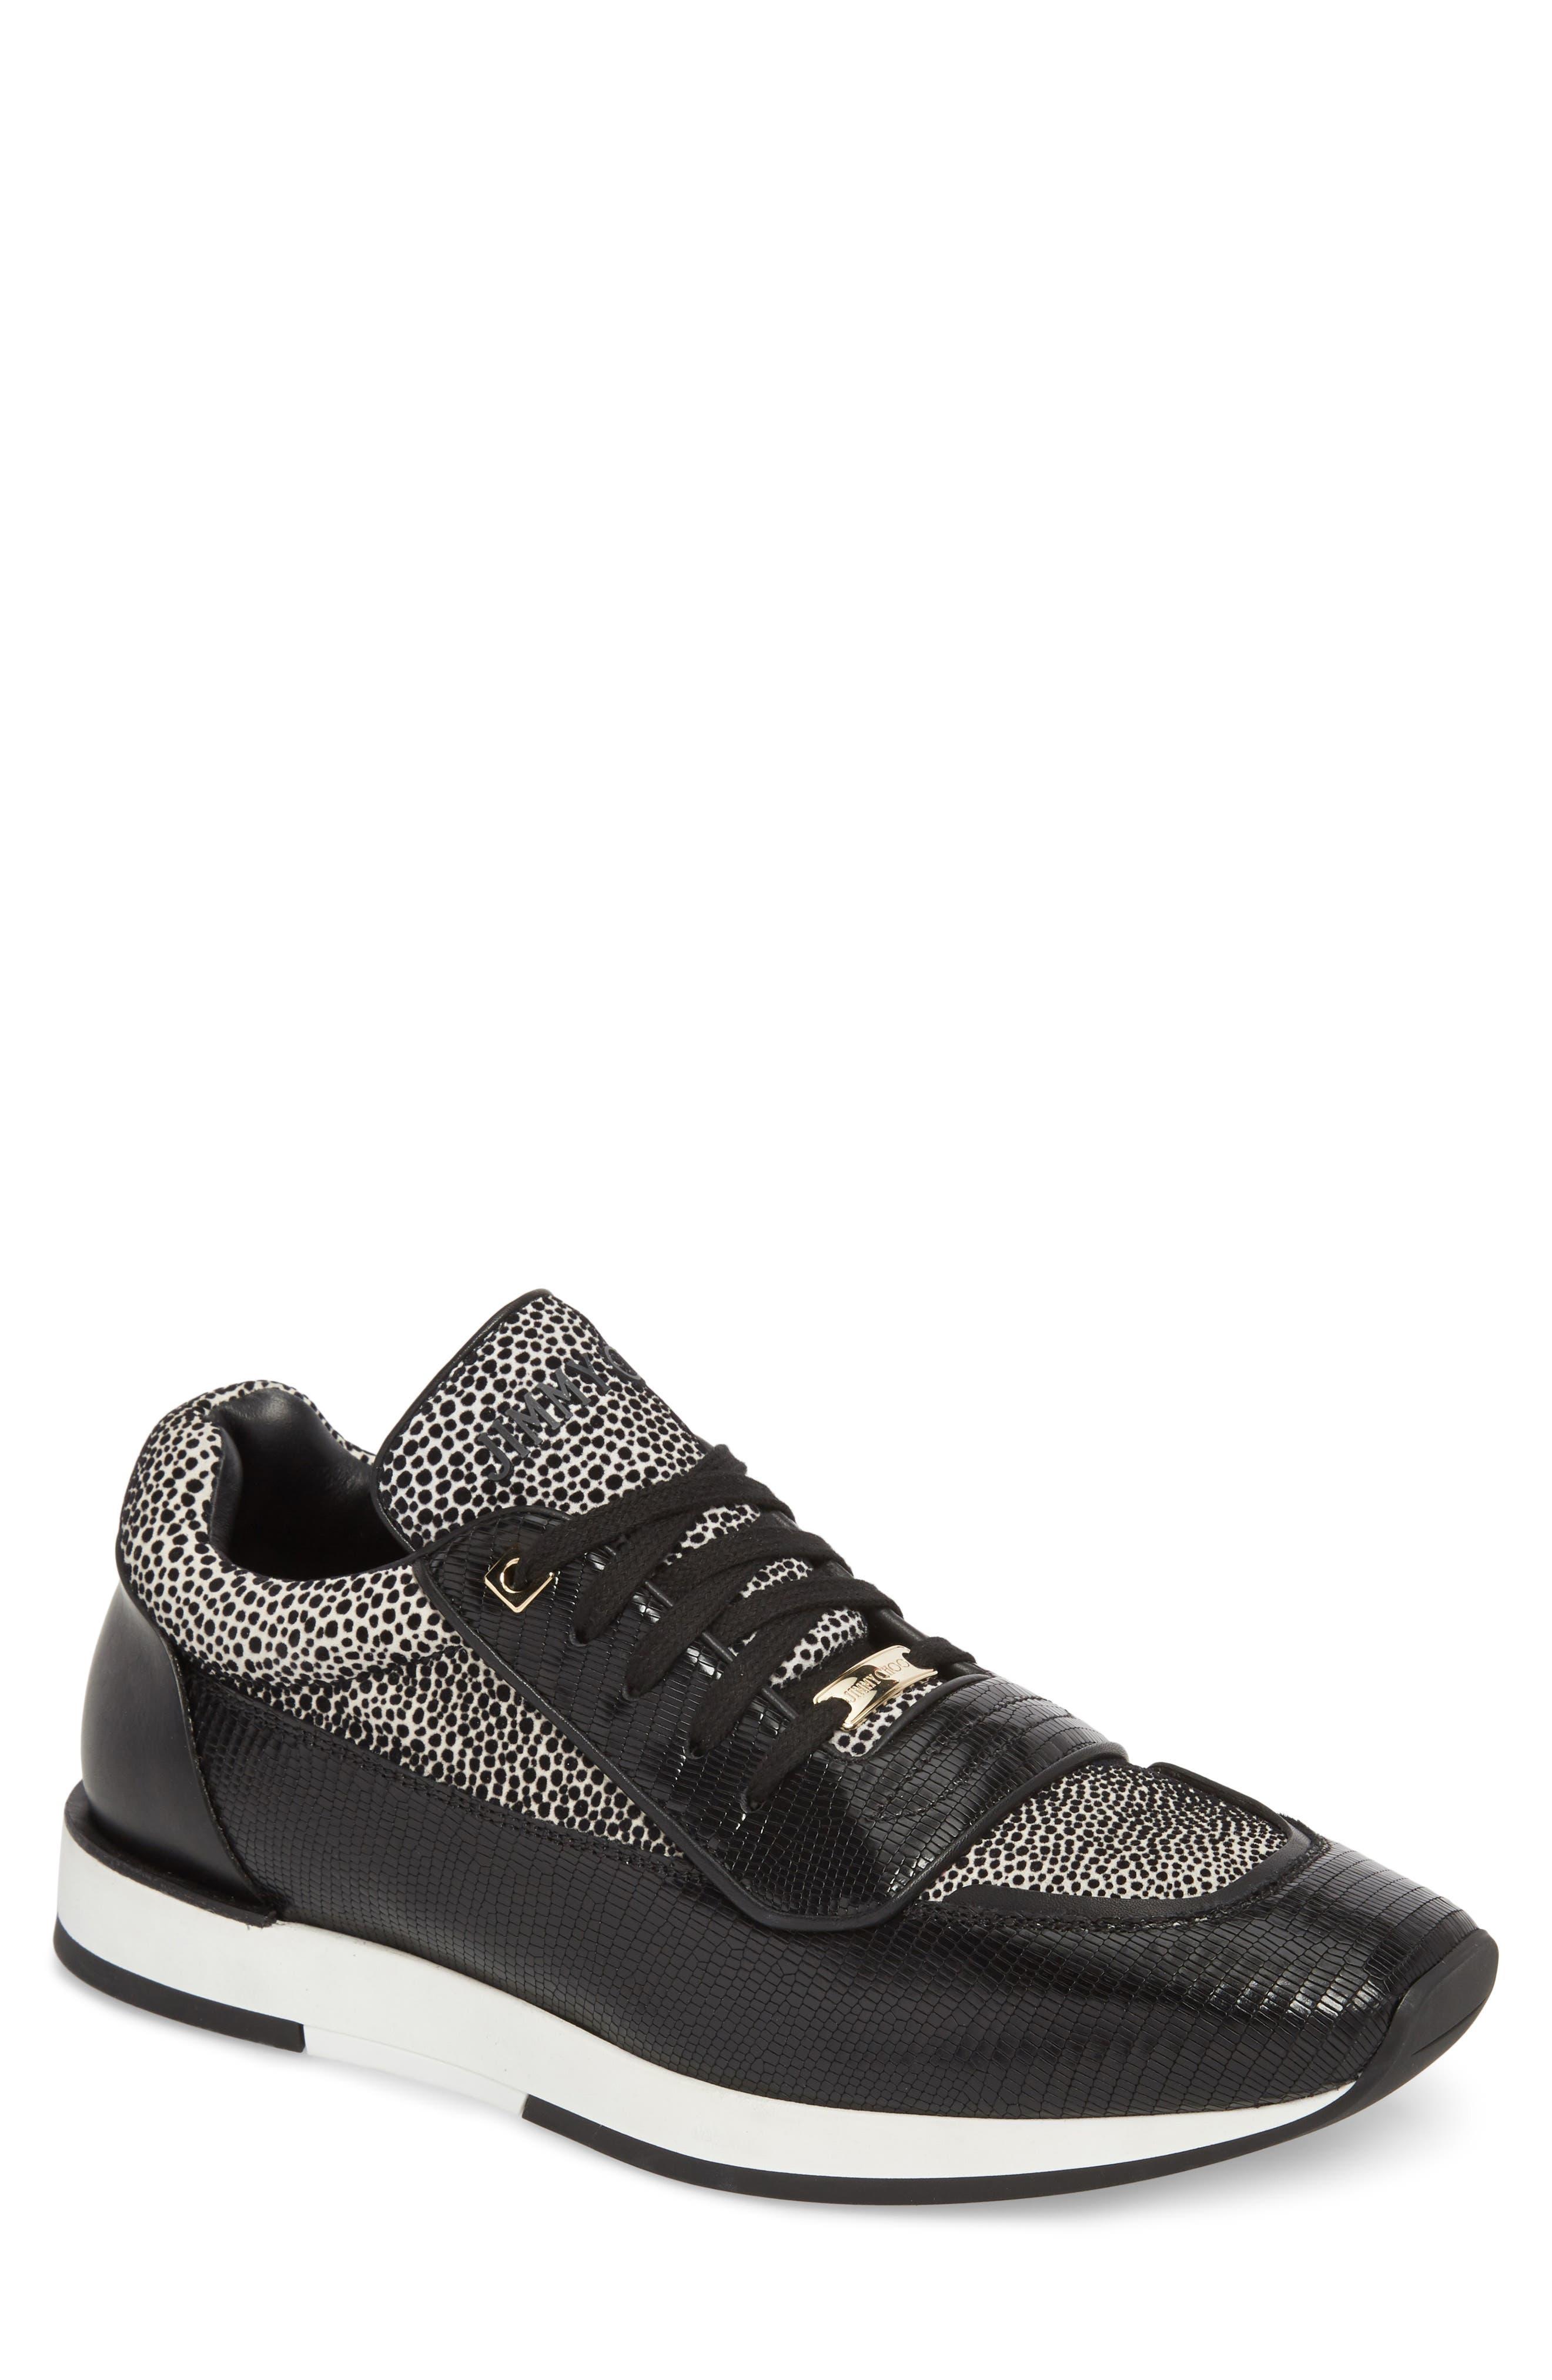 Jett Sneaker,                             Main thumbnail 1, color,                             BLACK/ WHITE